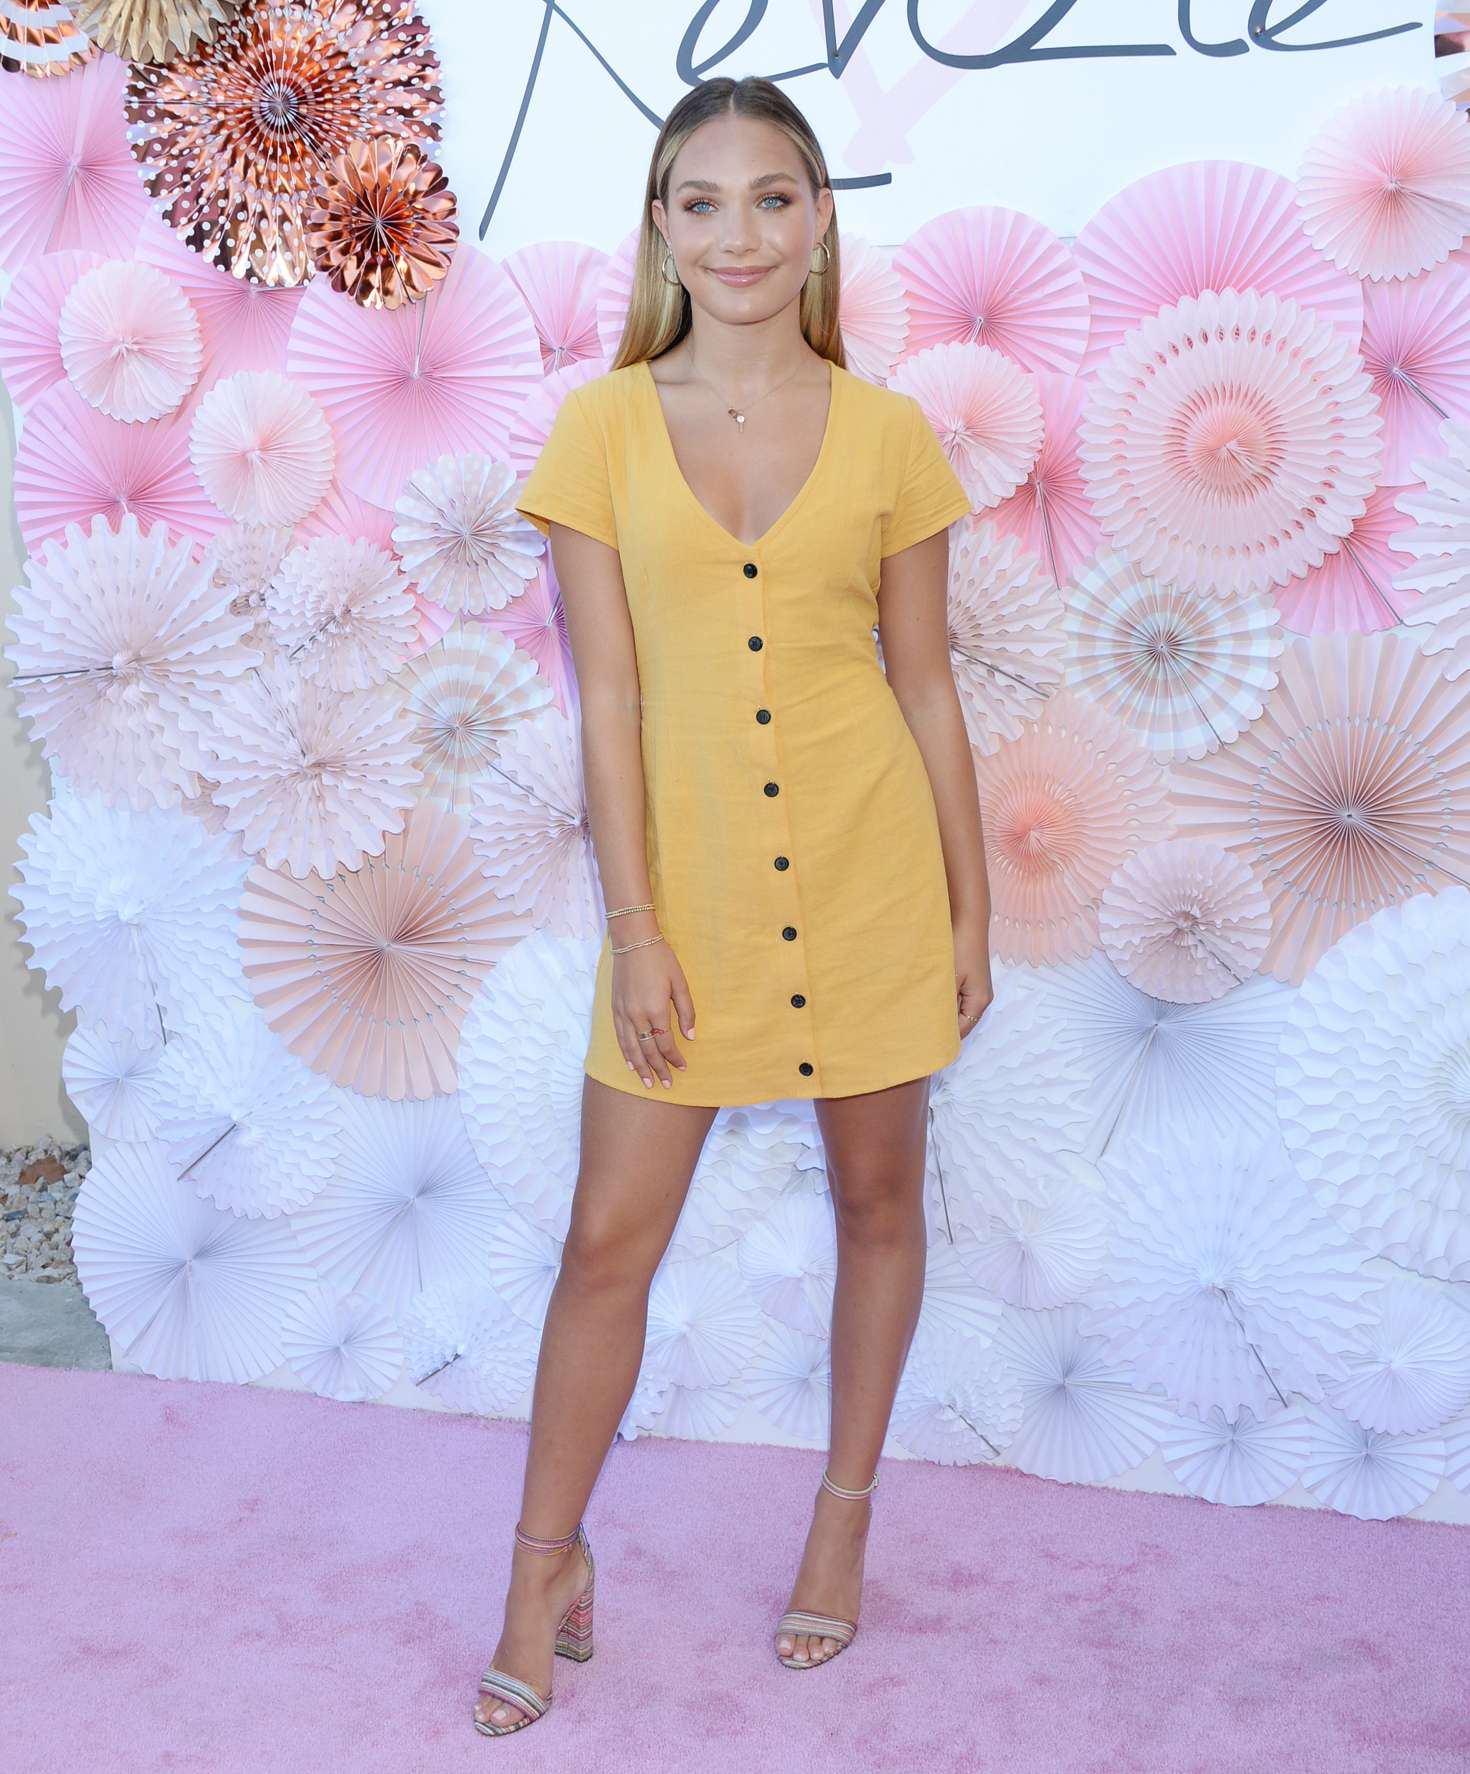 Maddie Ziegler 2018 : Maddie Ziegler: Mackenzie Ziegler Launches New BeautyLine Love Kenzie -08